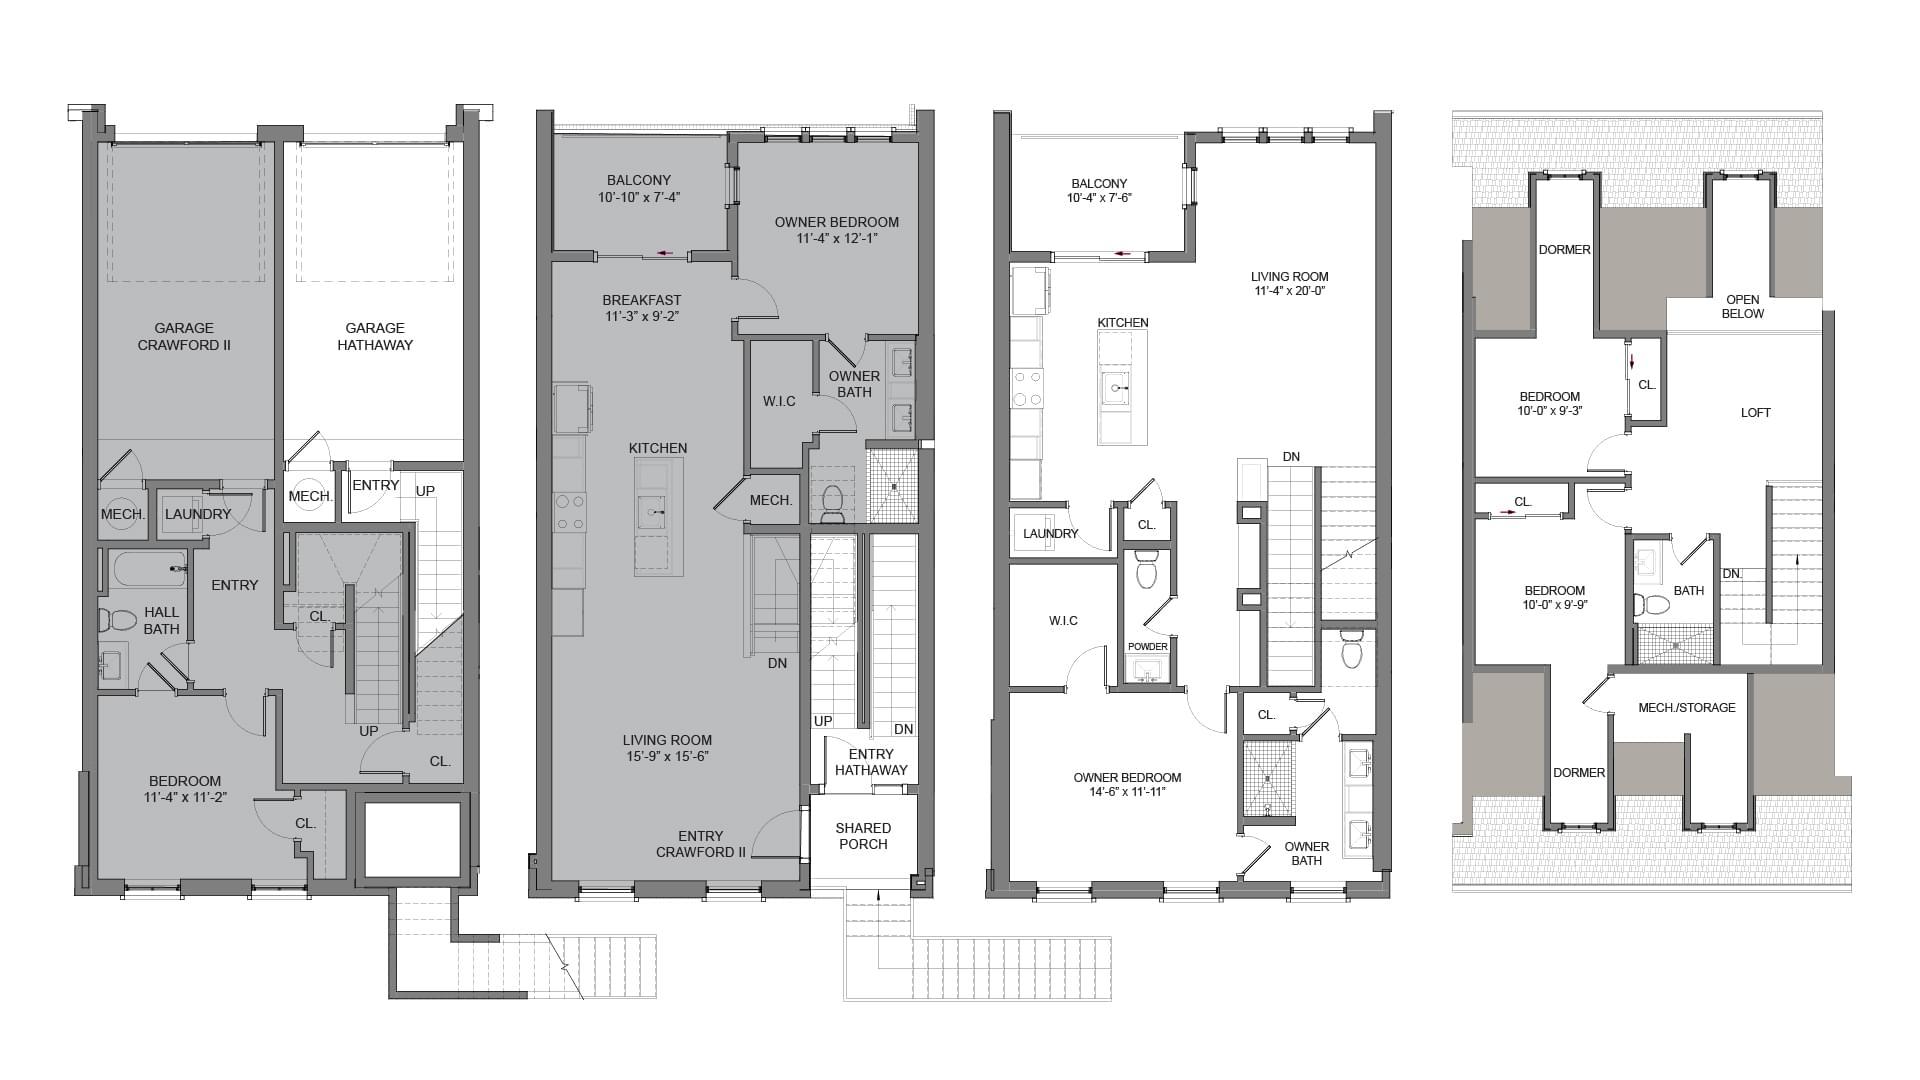 Floor Plans - Interior Unit. 3br New Home in Alpharetta, GA